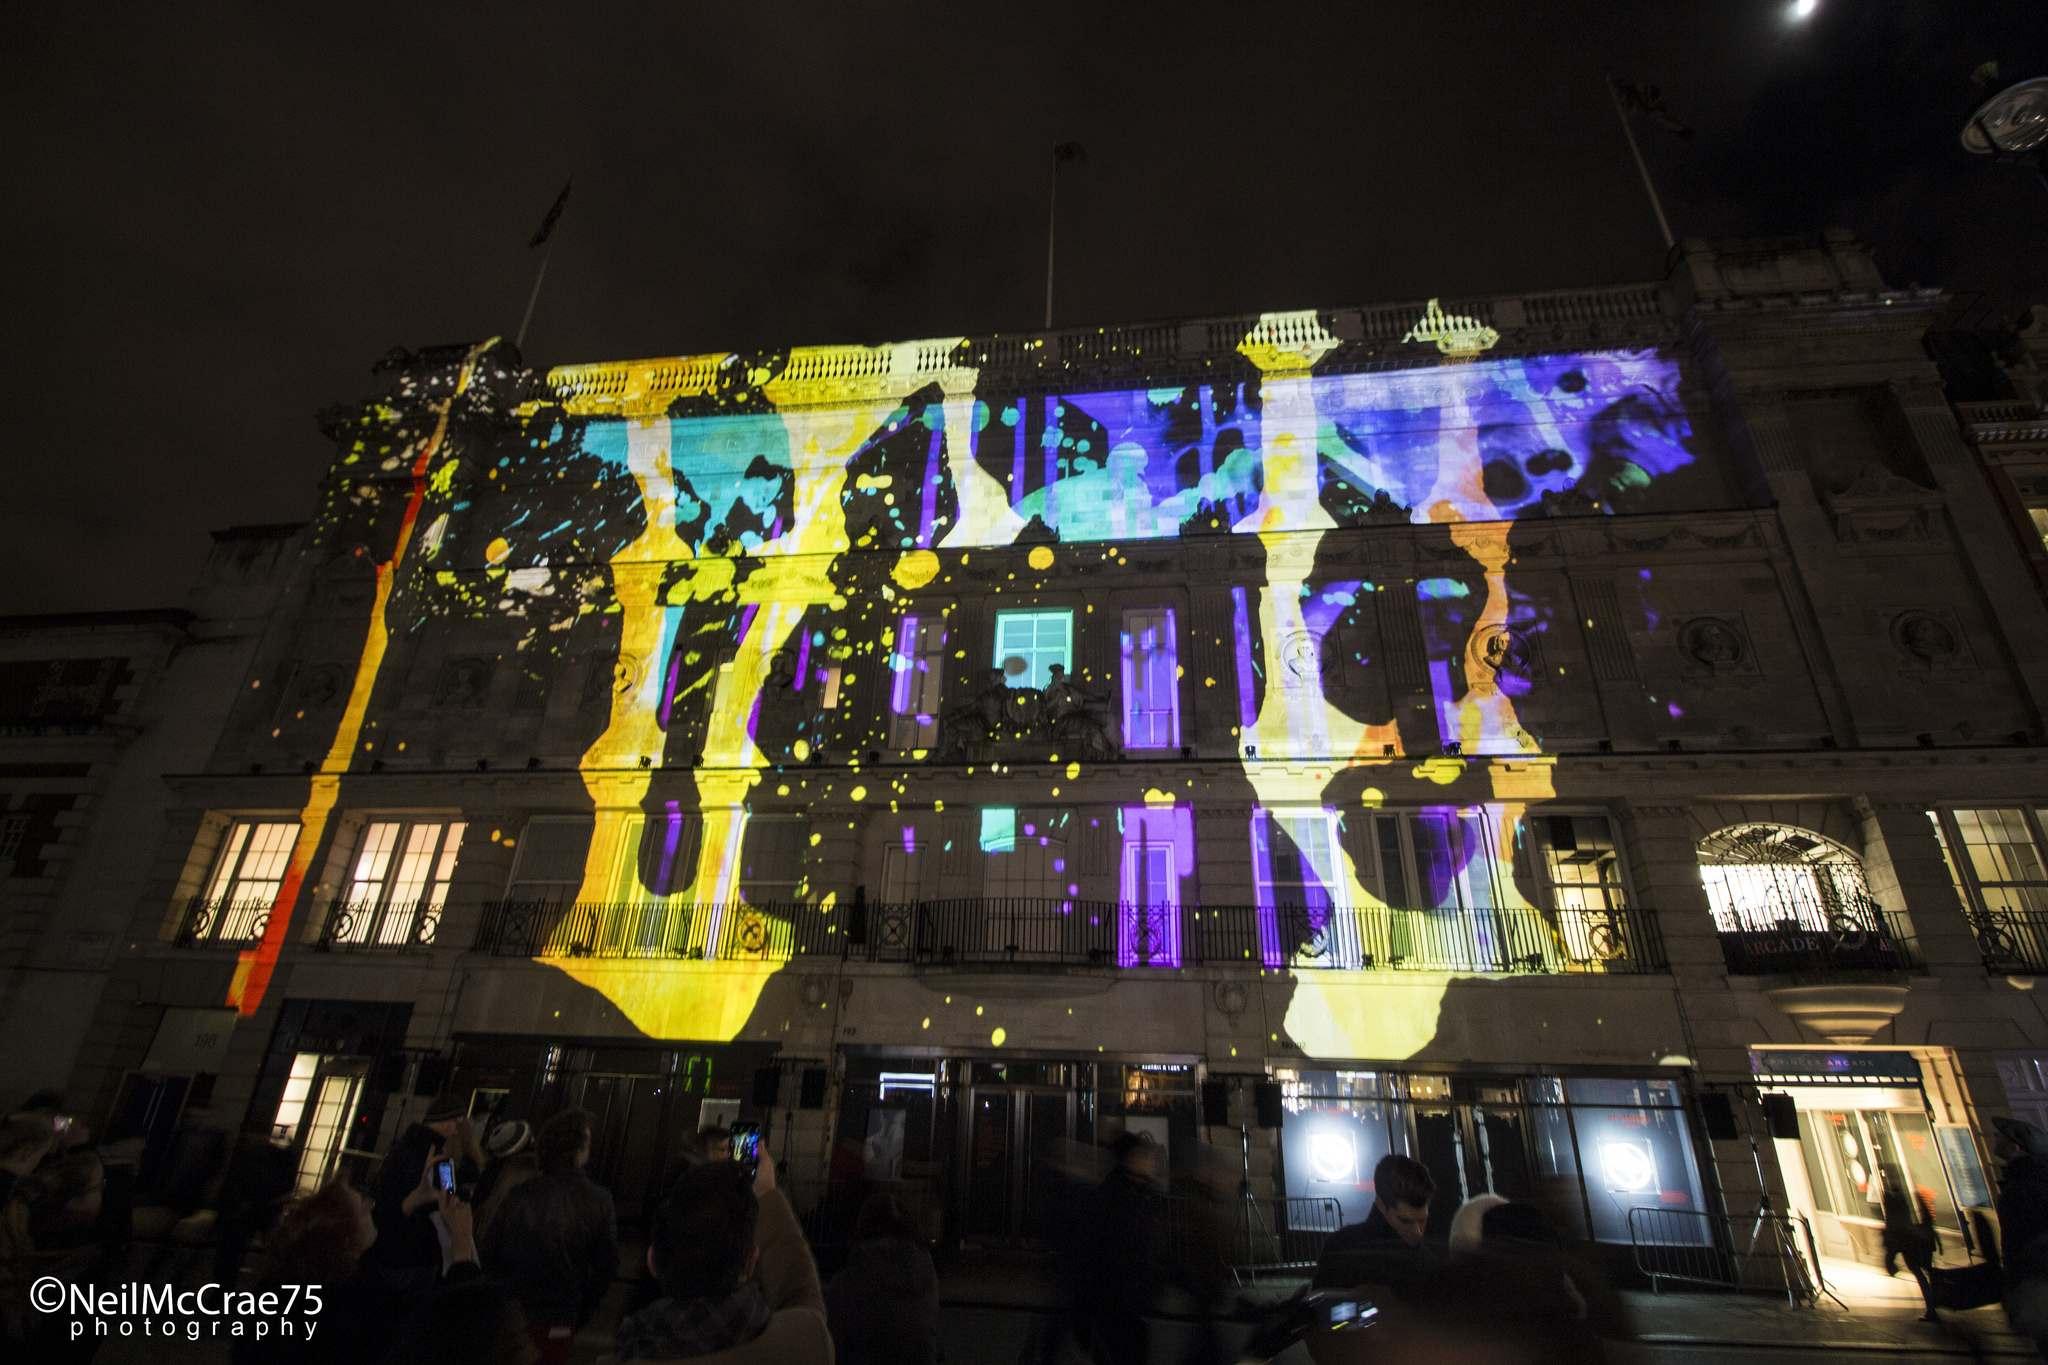 london lumiere festival12 The London Light Lumiere Festival by Neil McCrae